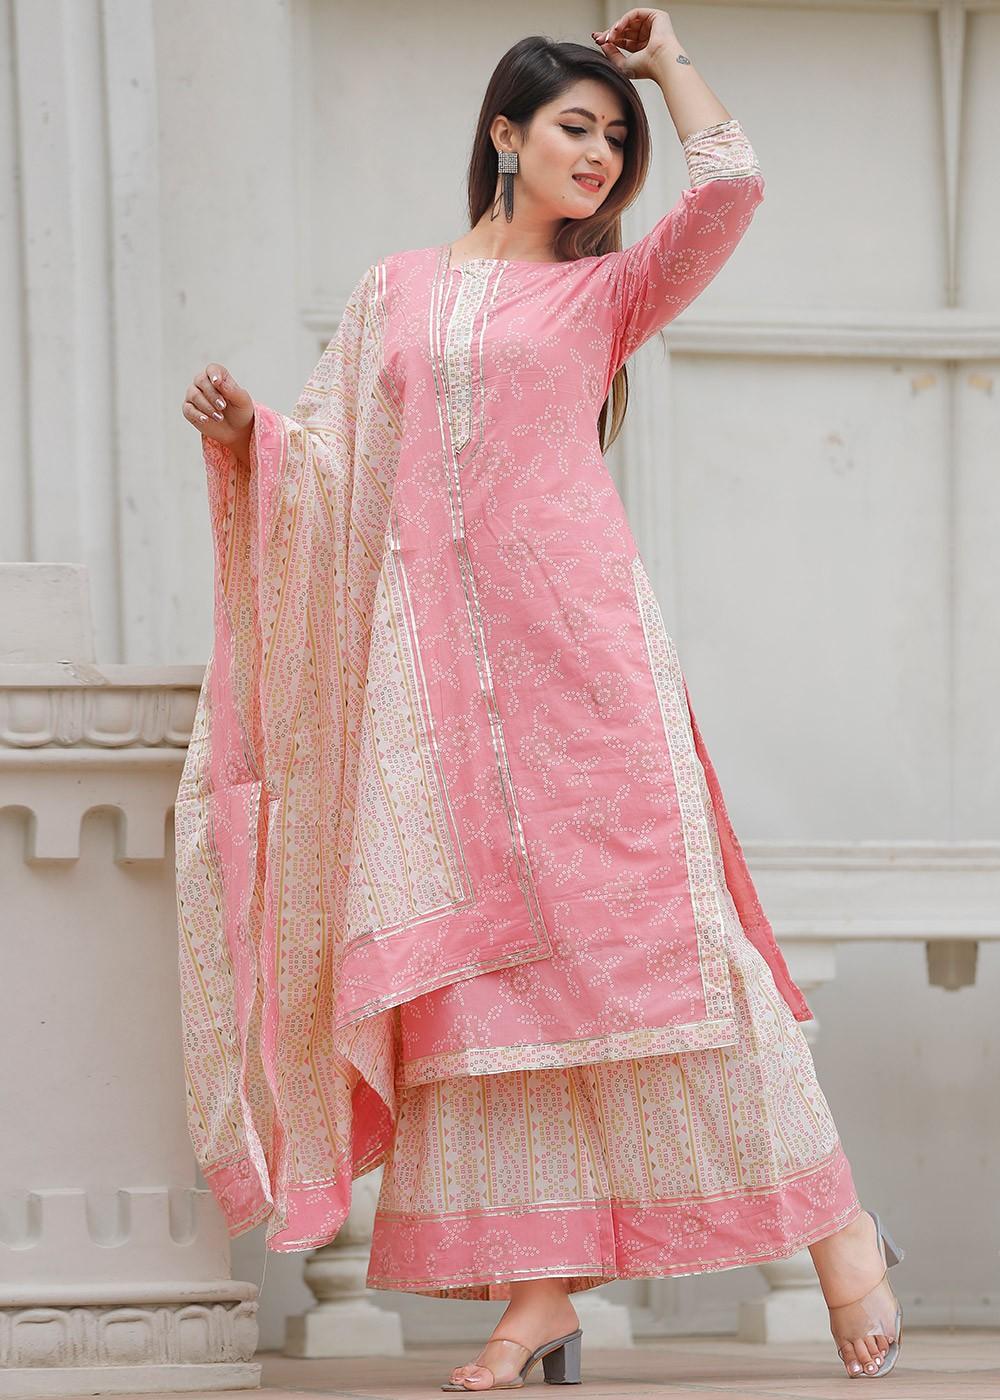 Peach Bandhej Printed Readymade Cotton Palazzo Suit Latest 3436SL07